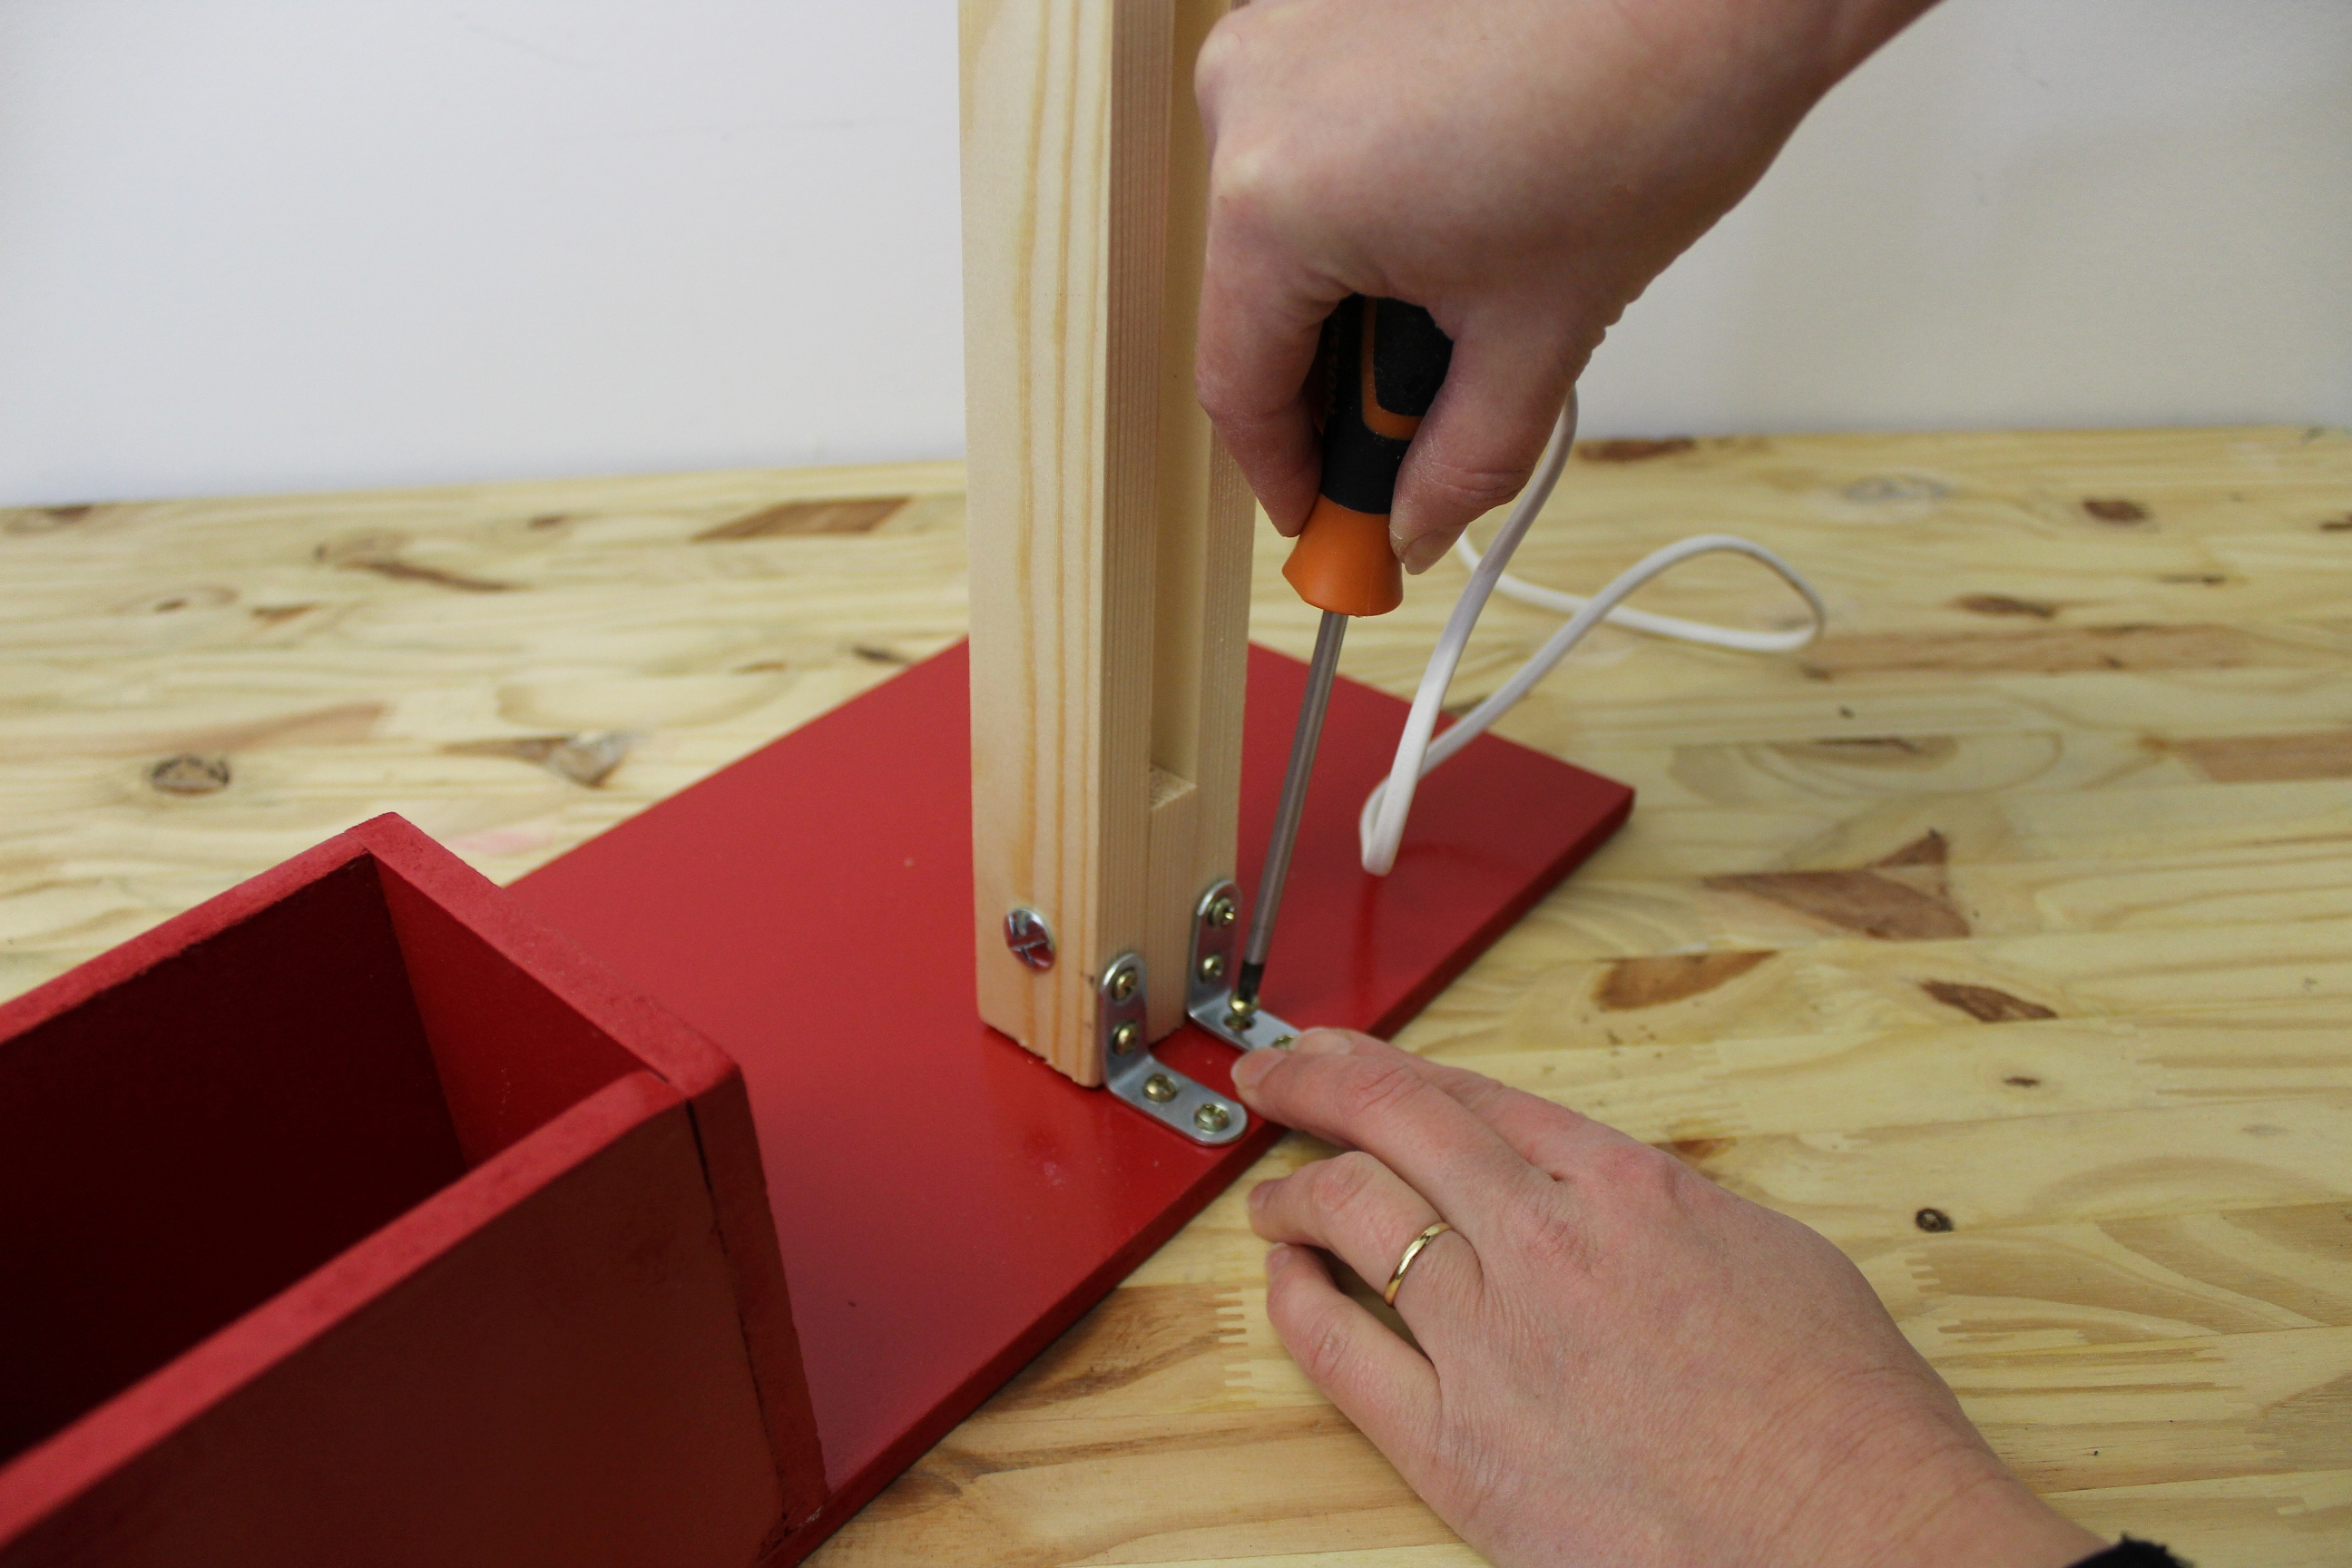 Propre Facile De F3tljk1c Fabriquer Lampe Sa Bureauc'est Tlc1FKJ